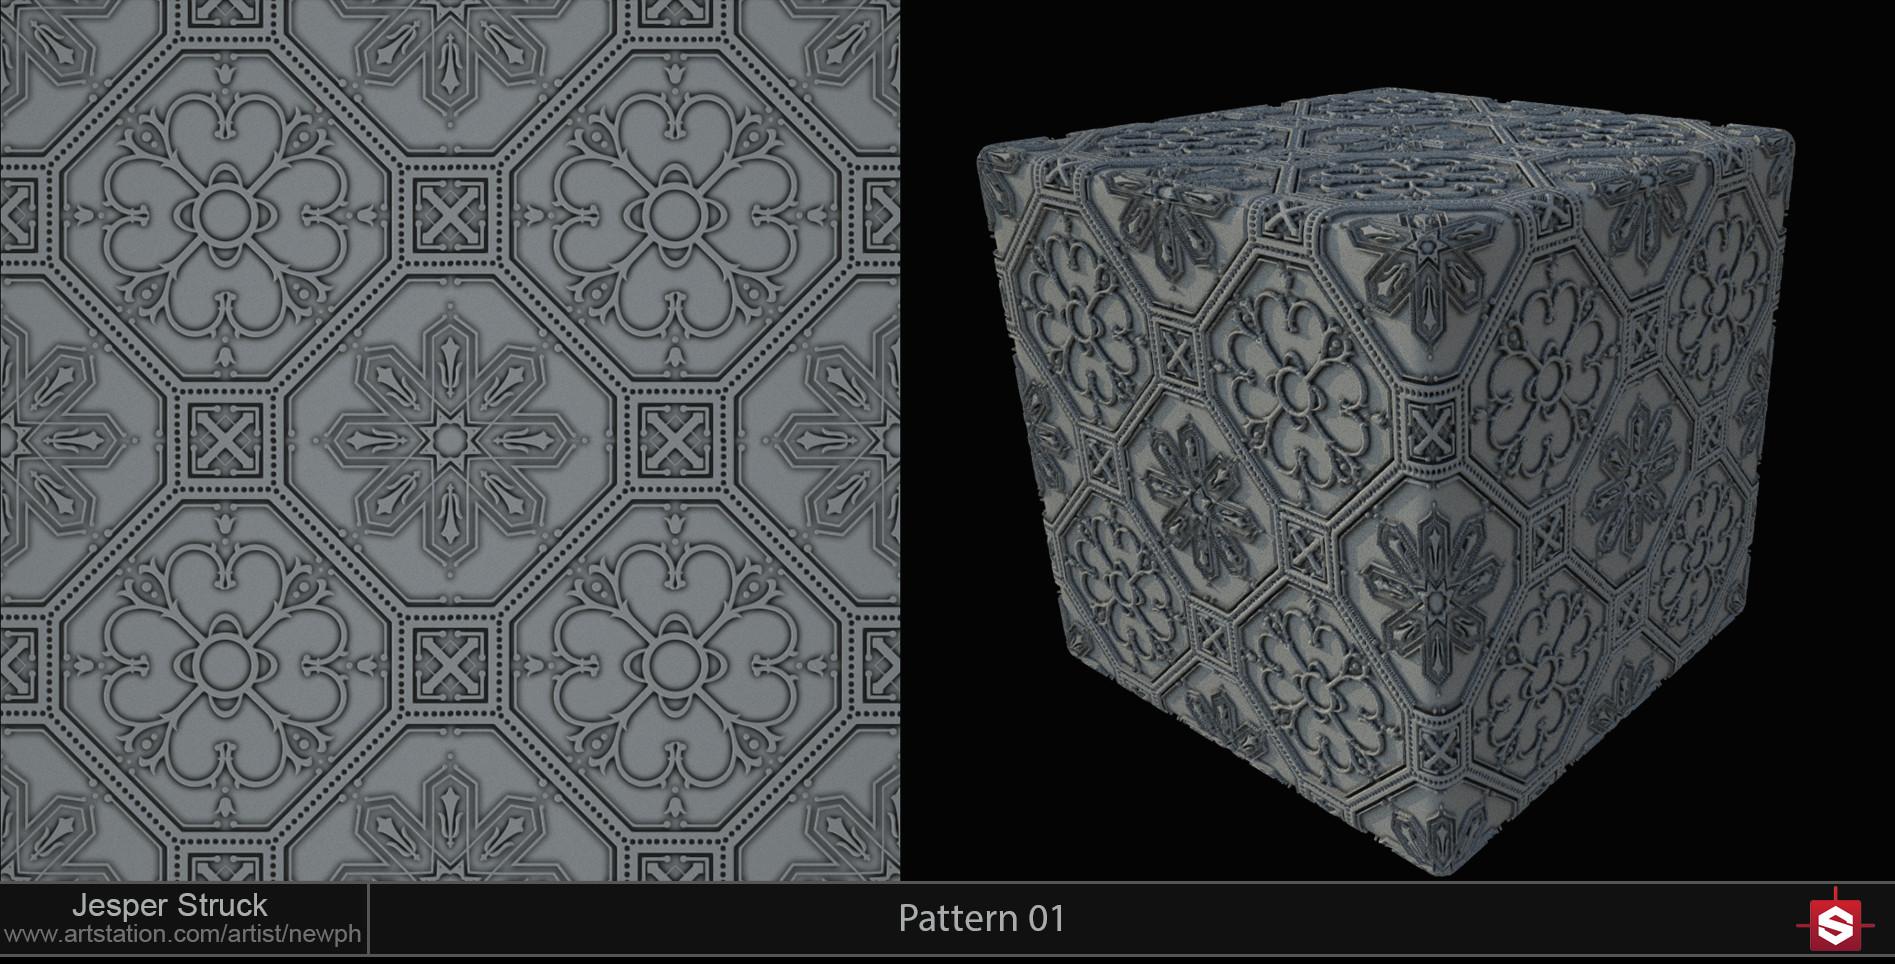 Jesper struck portfolio sd pattern 01